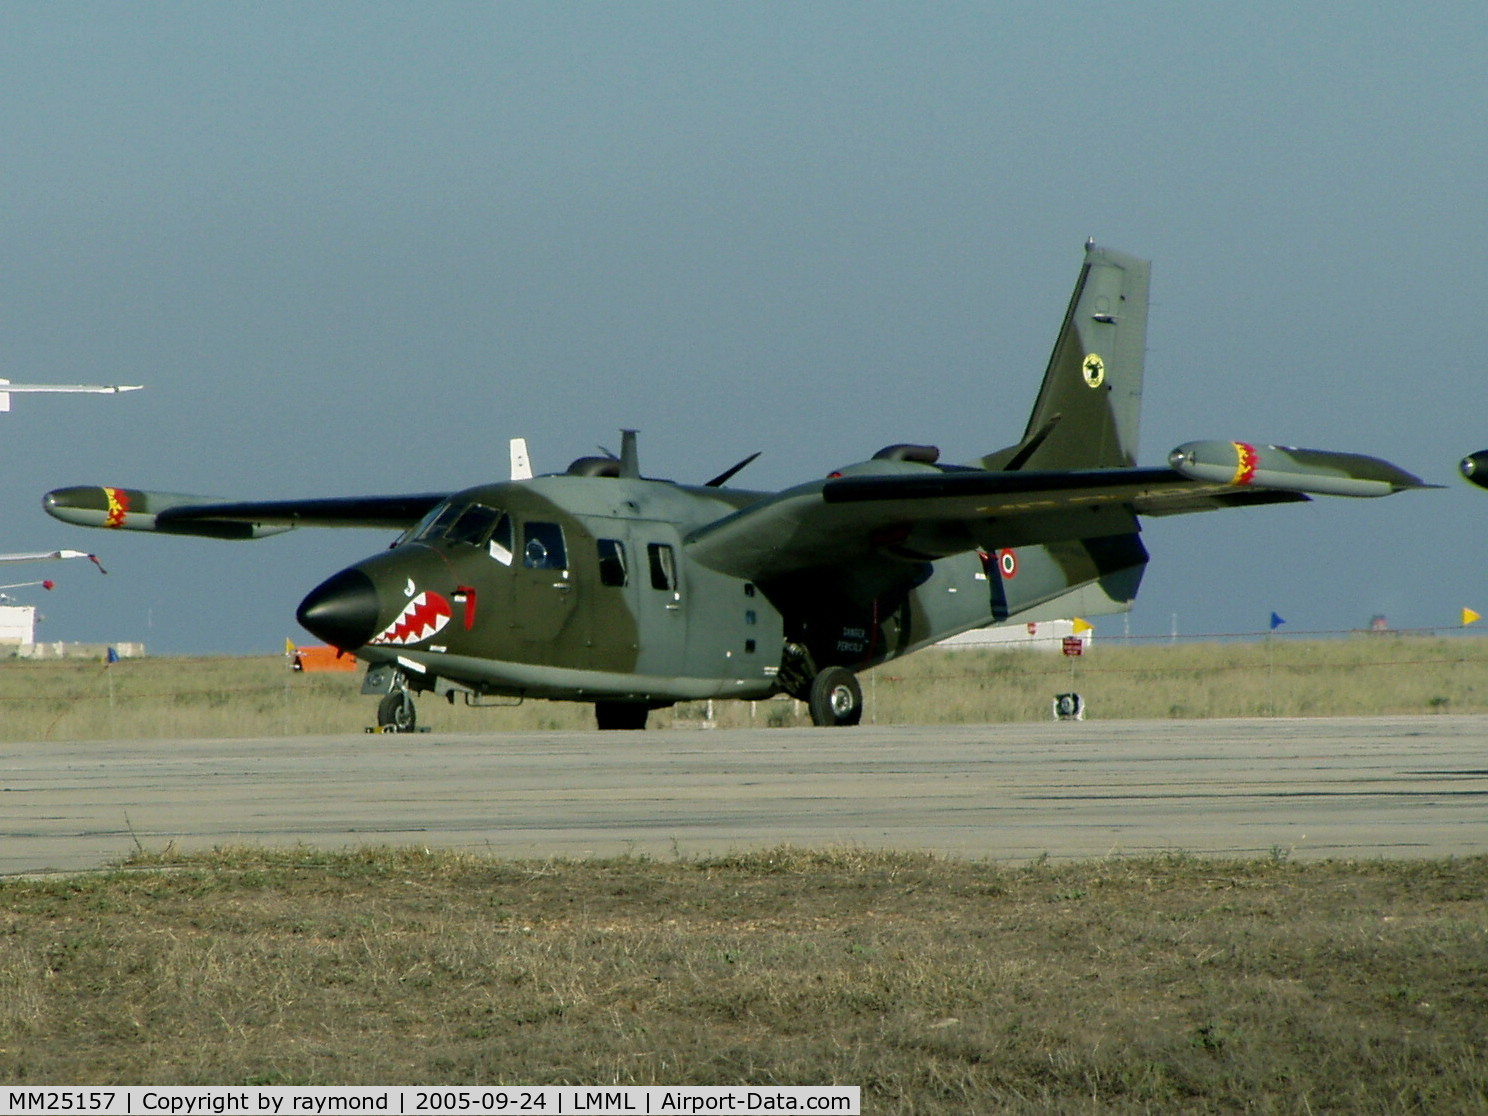 MM25157, Piaggio P-166DL-3 C/N 476, P166 MM25157 Italian Air Force